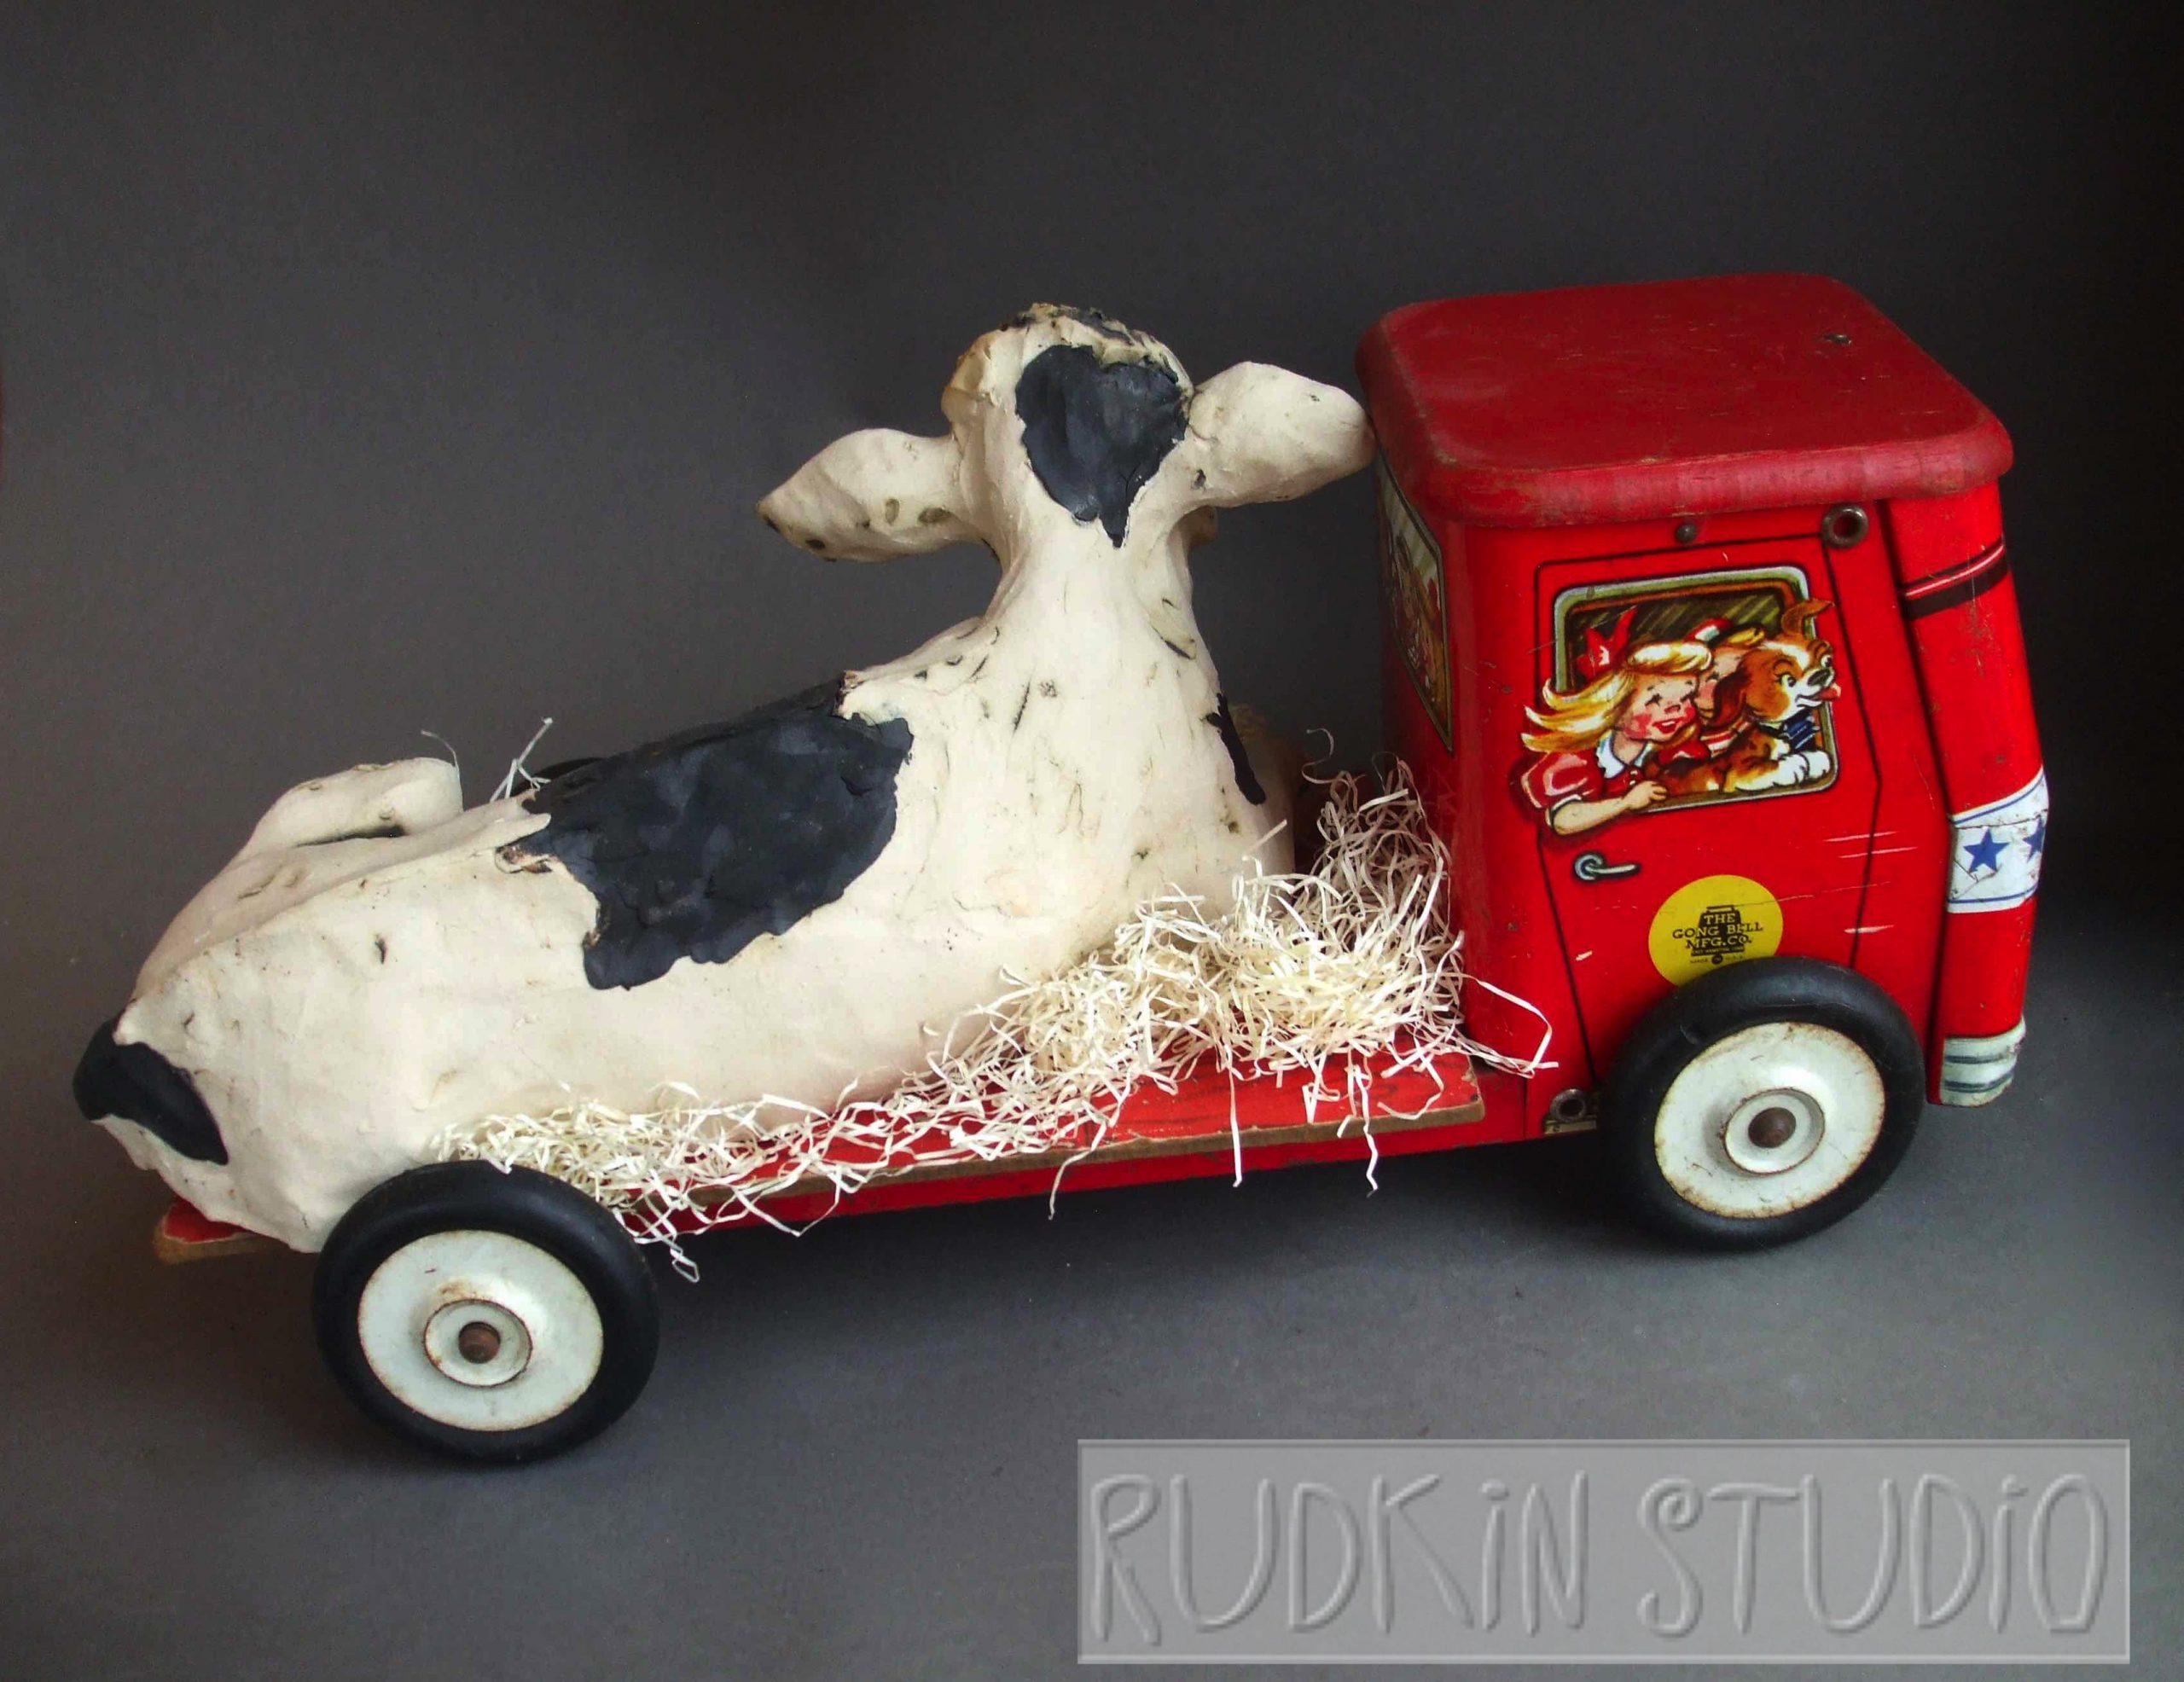 Cow Sculpture Road Trip Rear